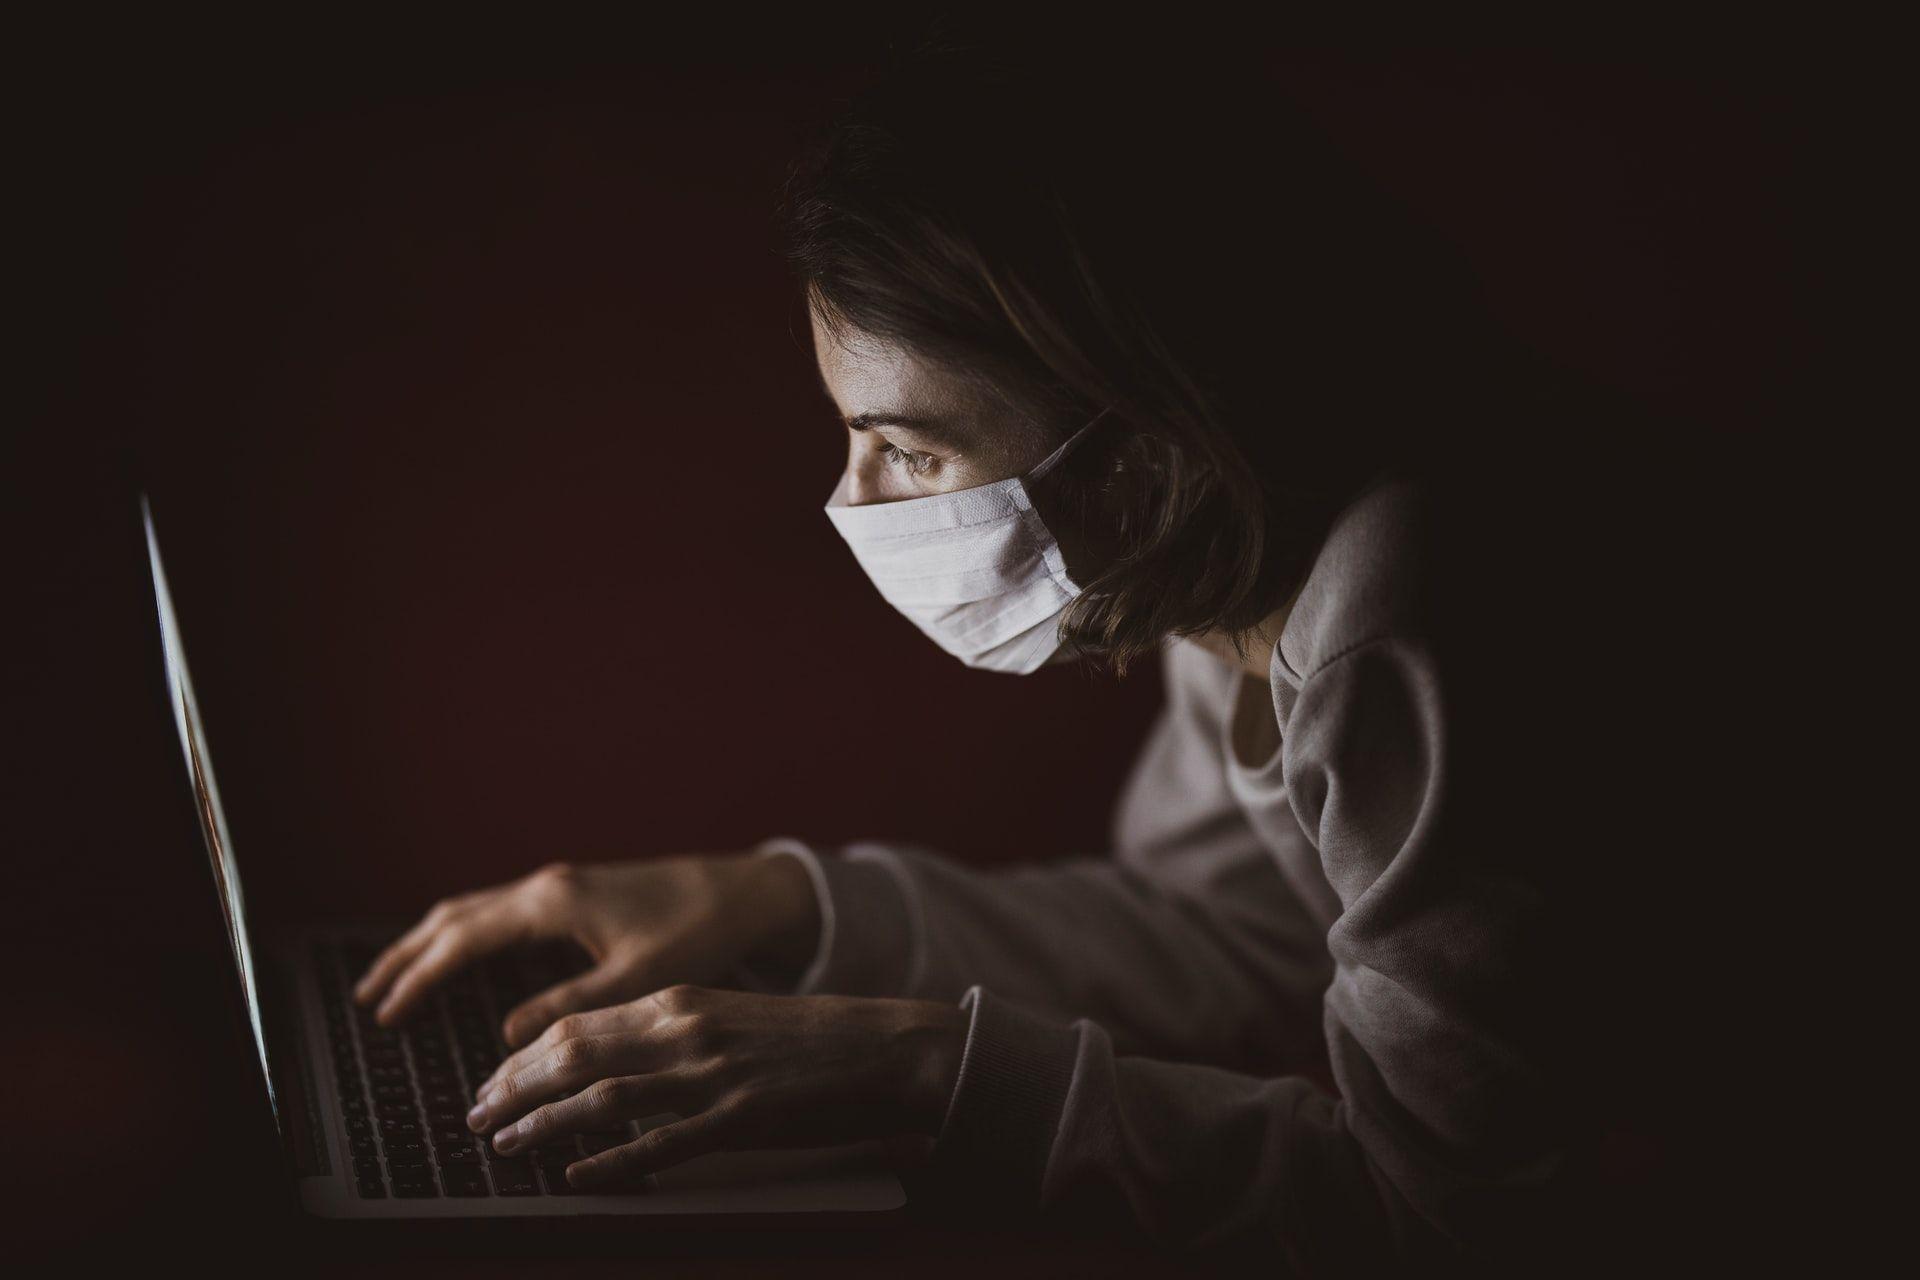 Mujer trabajando con mascarilla